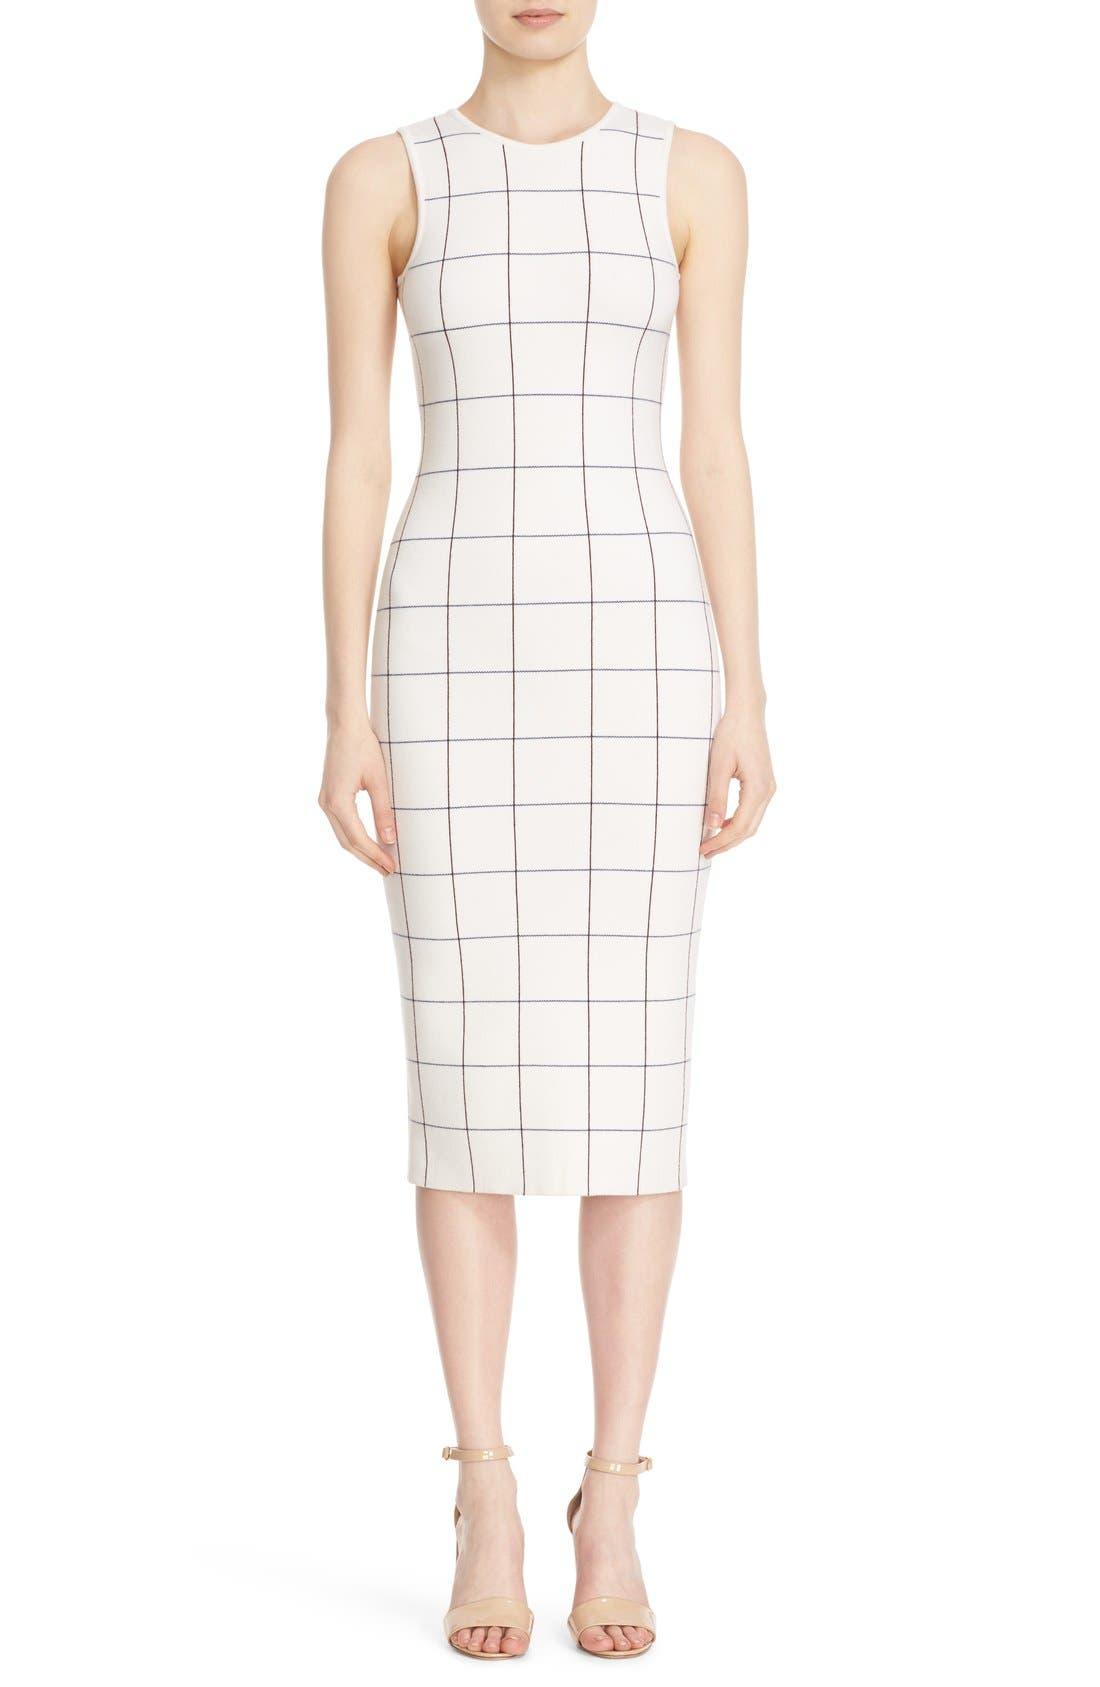 Victoria Beckham Intarsia Check Sheath Dress,                             Main thumbnail 1, color,                             100